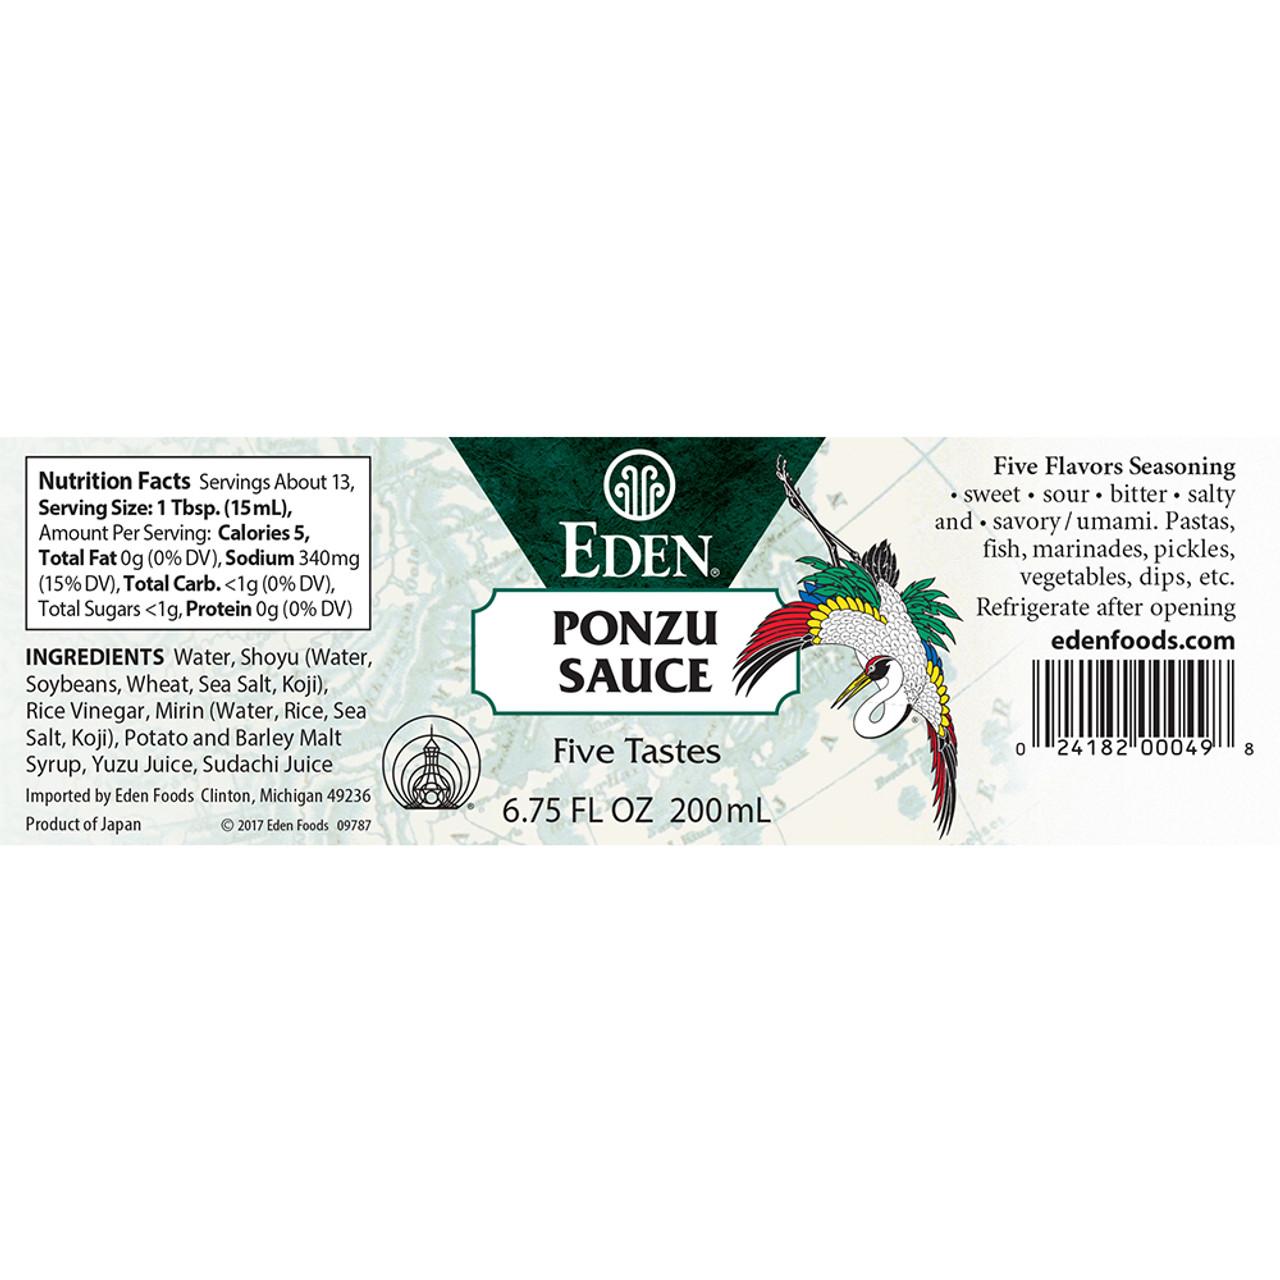 Ponzu Sauce - five flavor seasoning